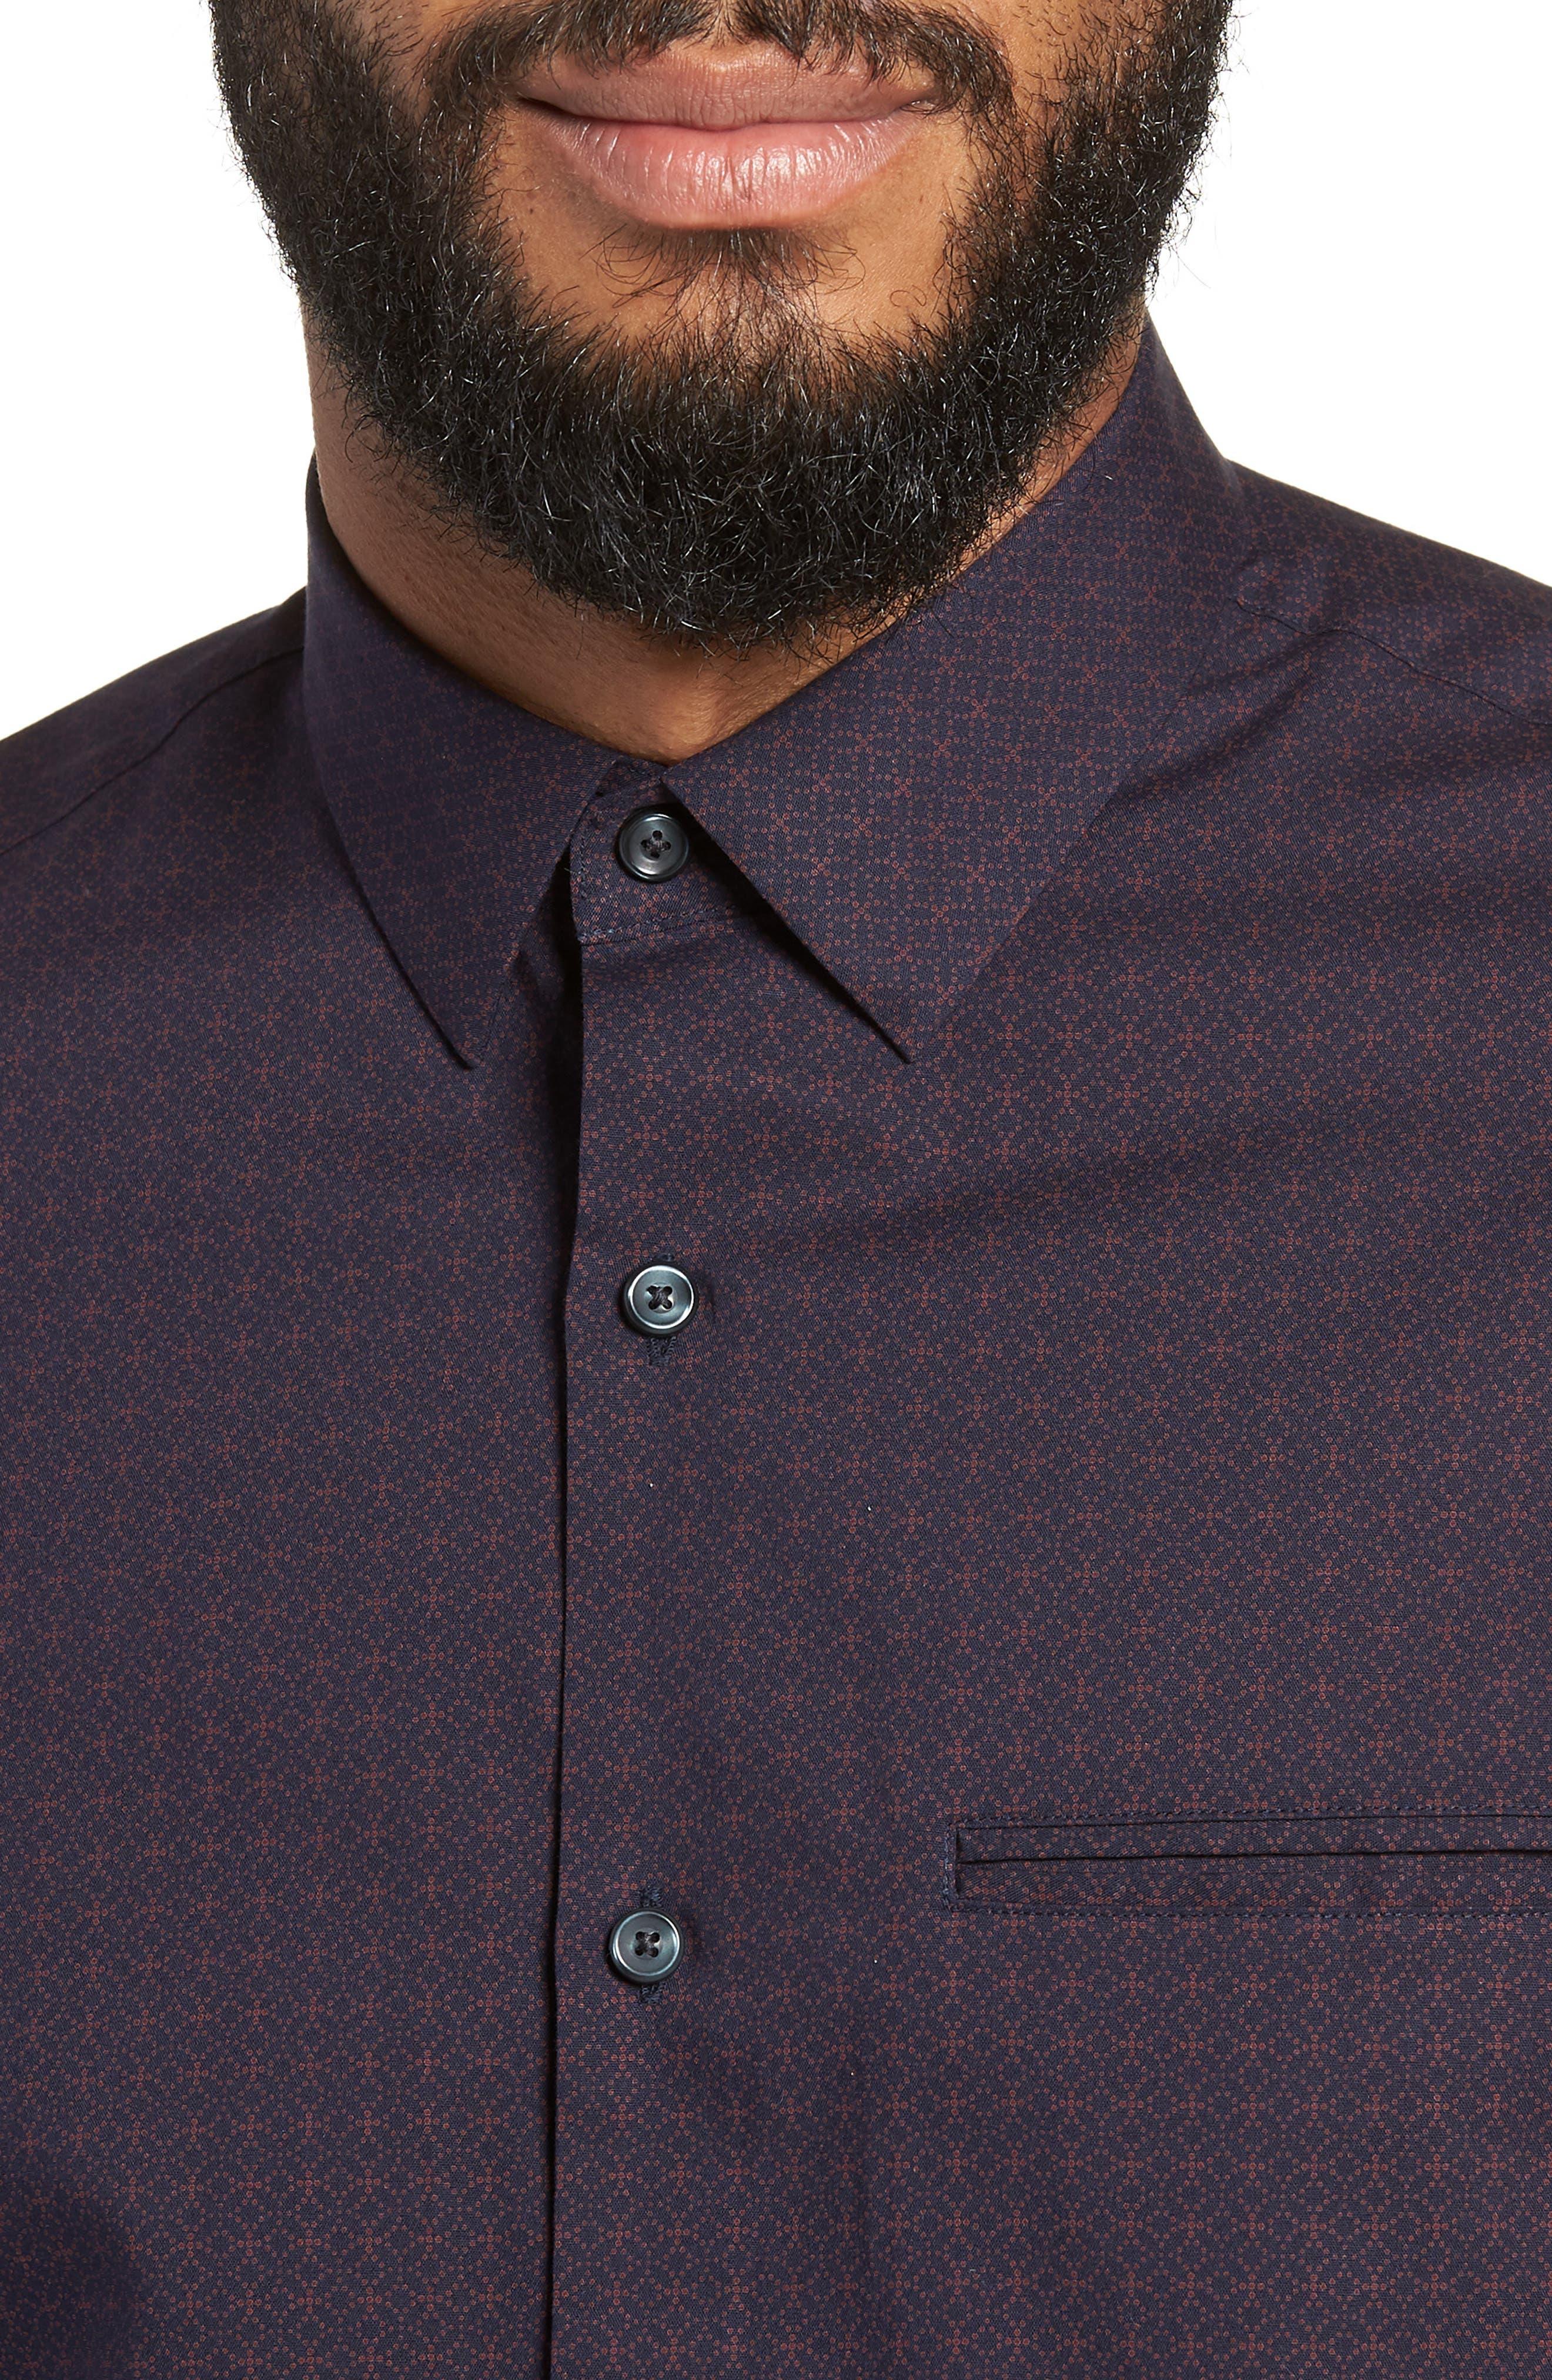 Slim Fit Print Non Iron Sport Shirt,                             Alternate thumbnail 4, color,                             NAVY NIGHT BURGUNDY GEO